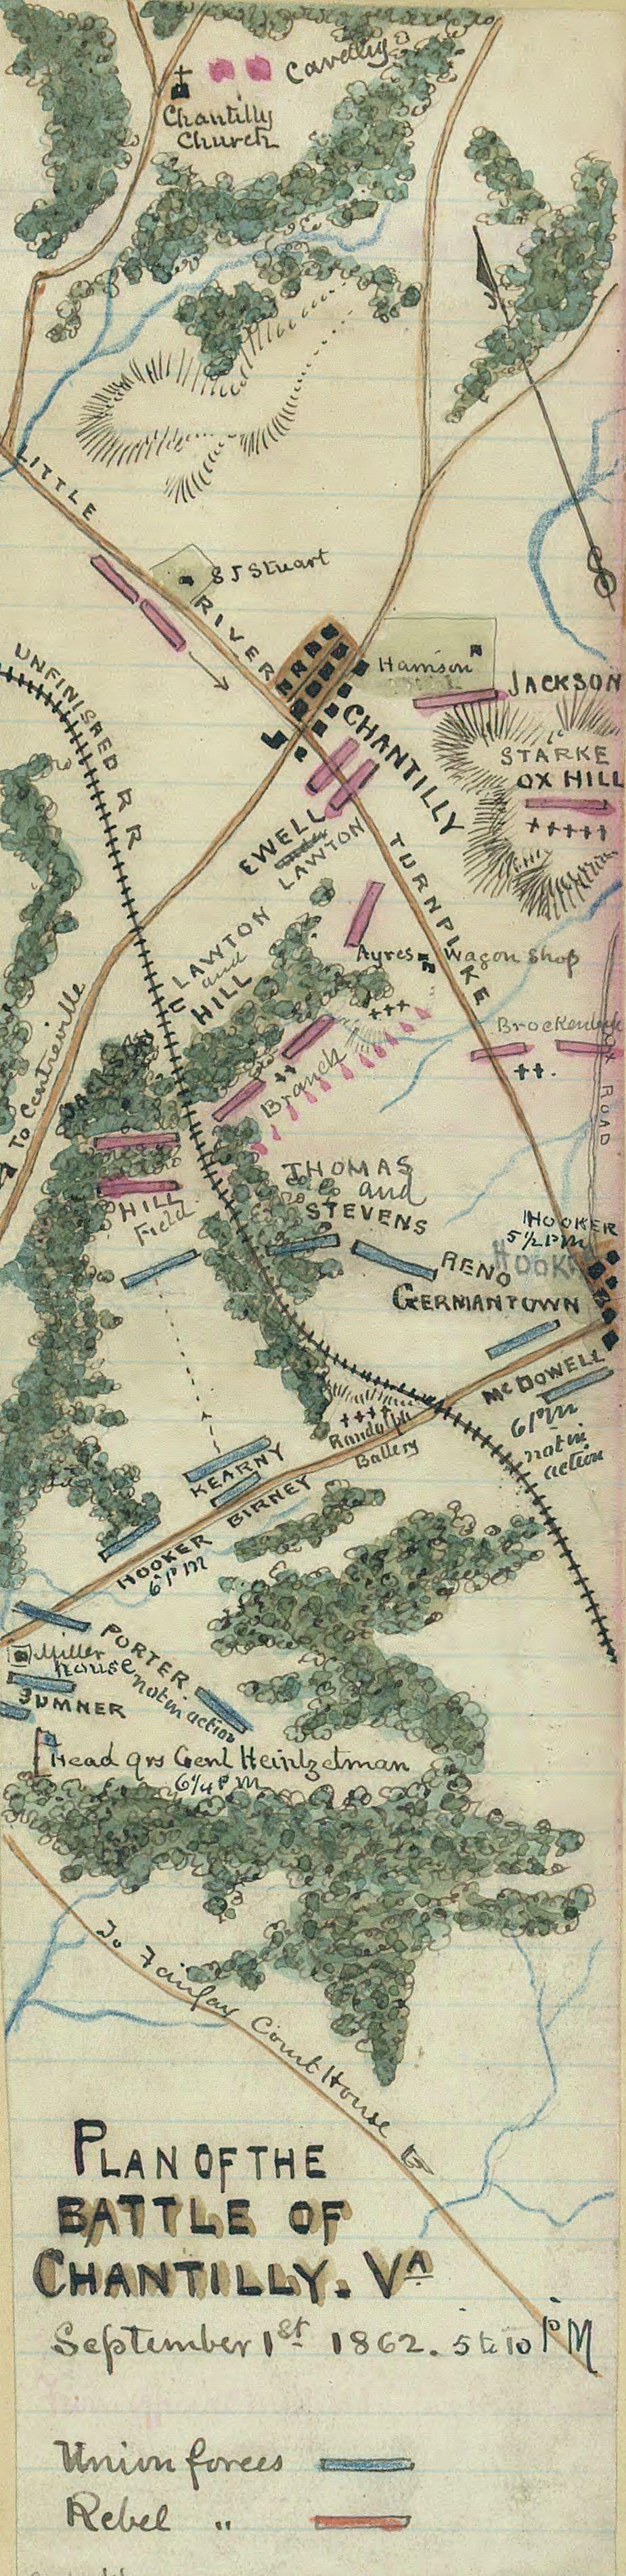 Plan of the Battle of Chantilly, Va.